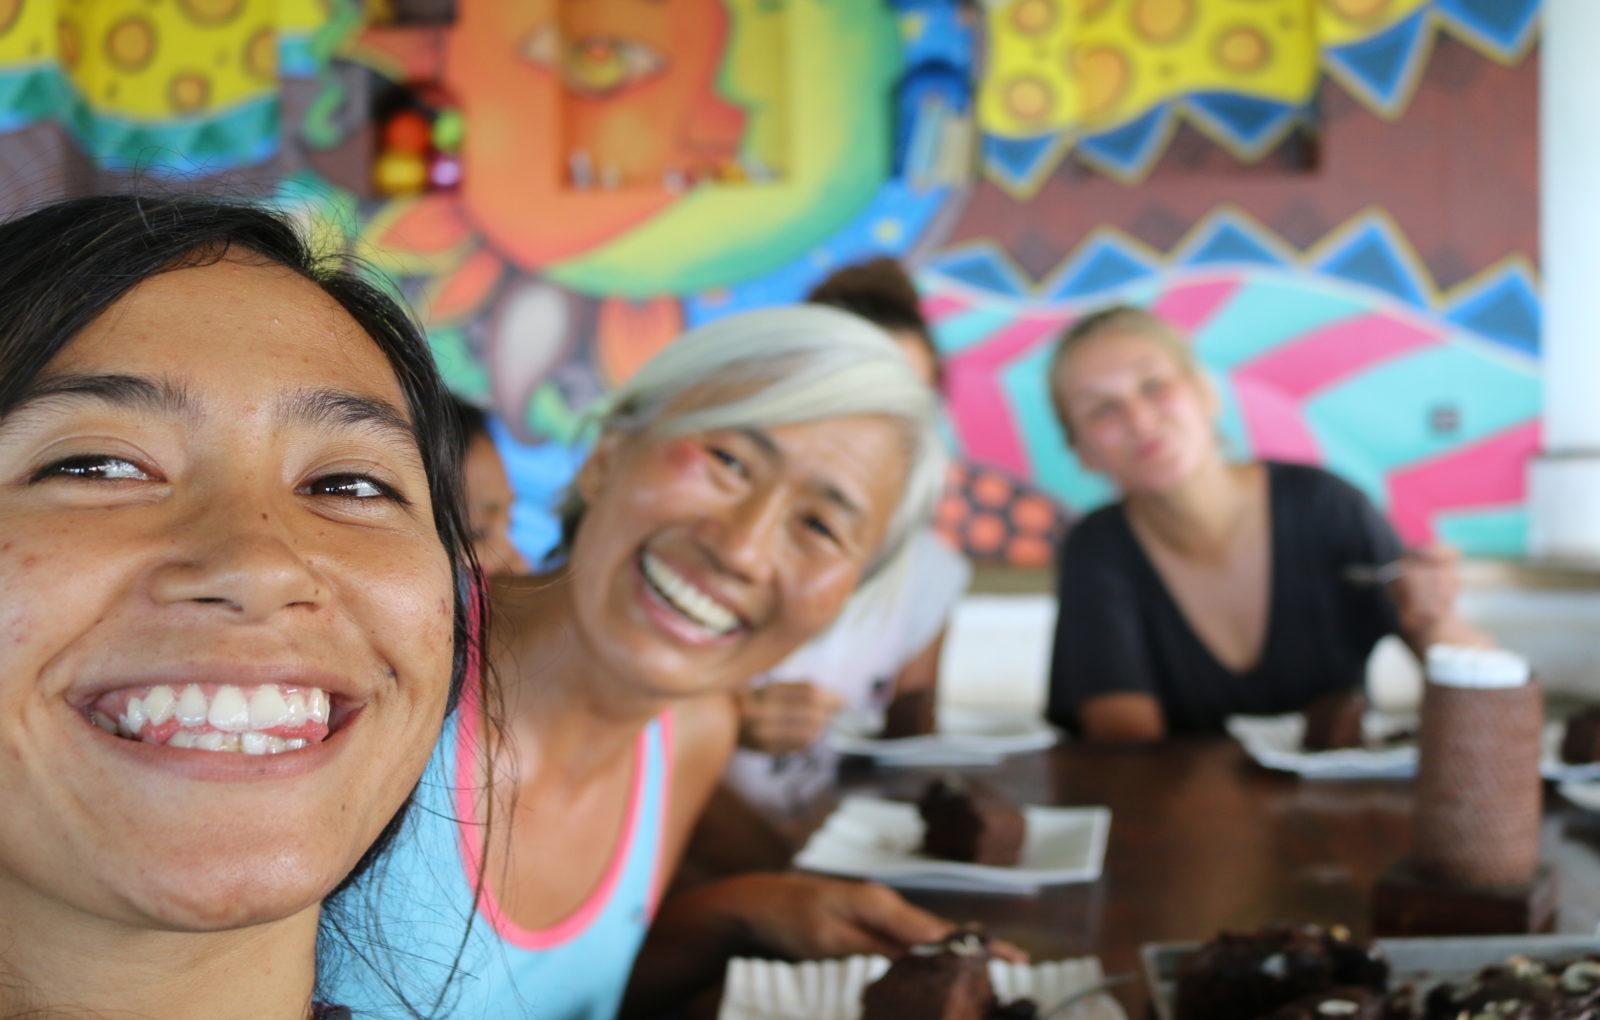 Ashtari restaurant lounge Kuta Lombok Indonesia Surf Yoga Loft nature view Horizon sunset Event